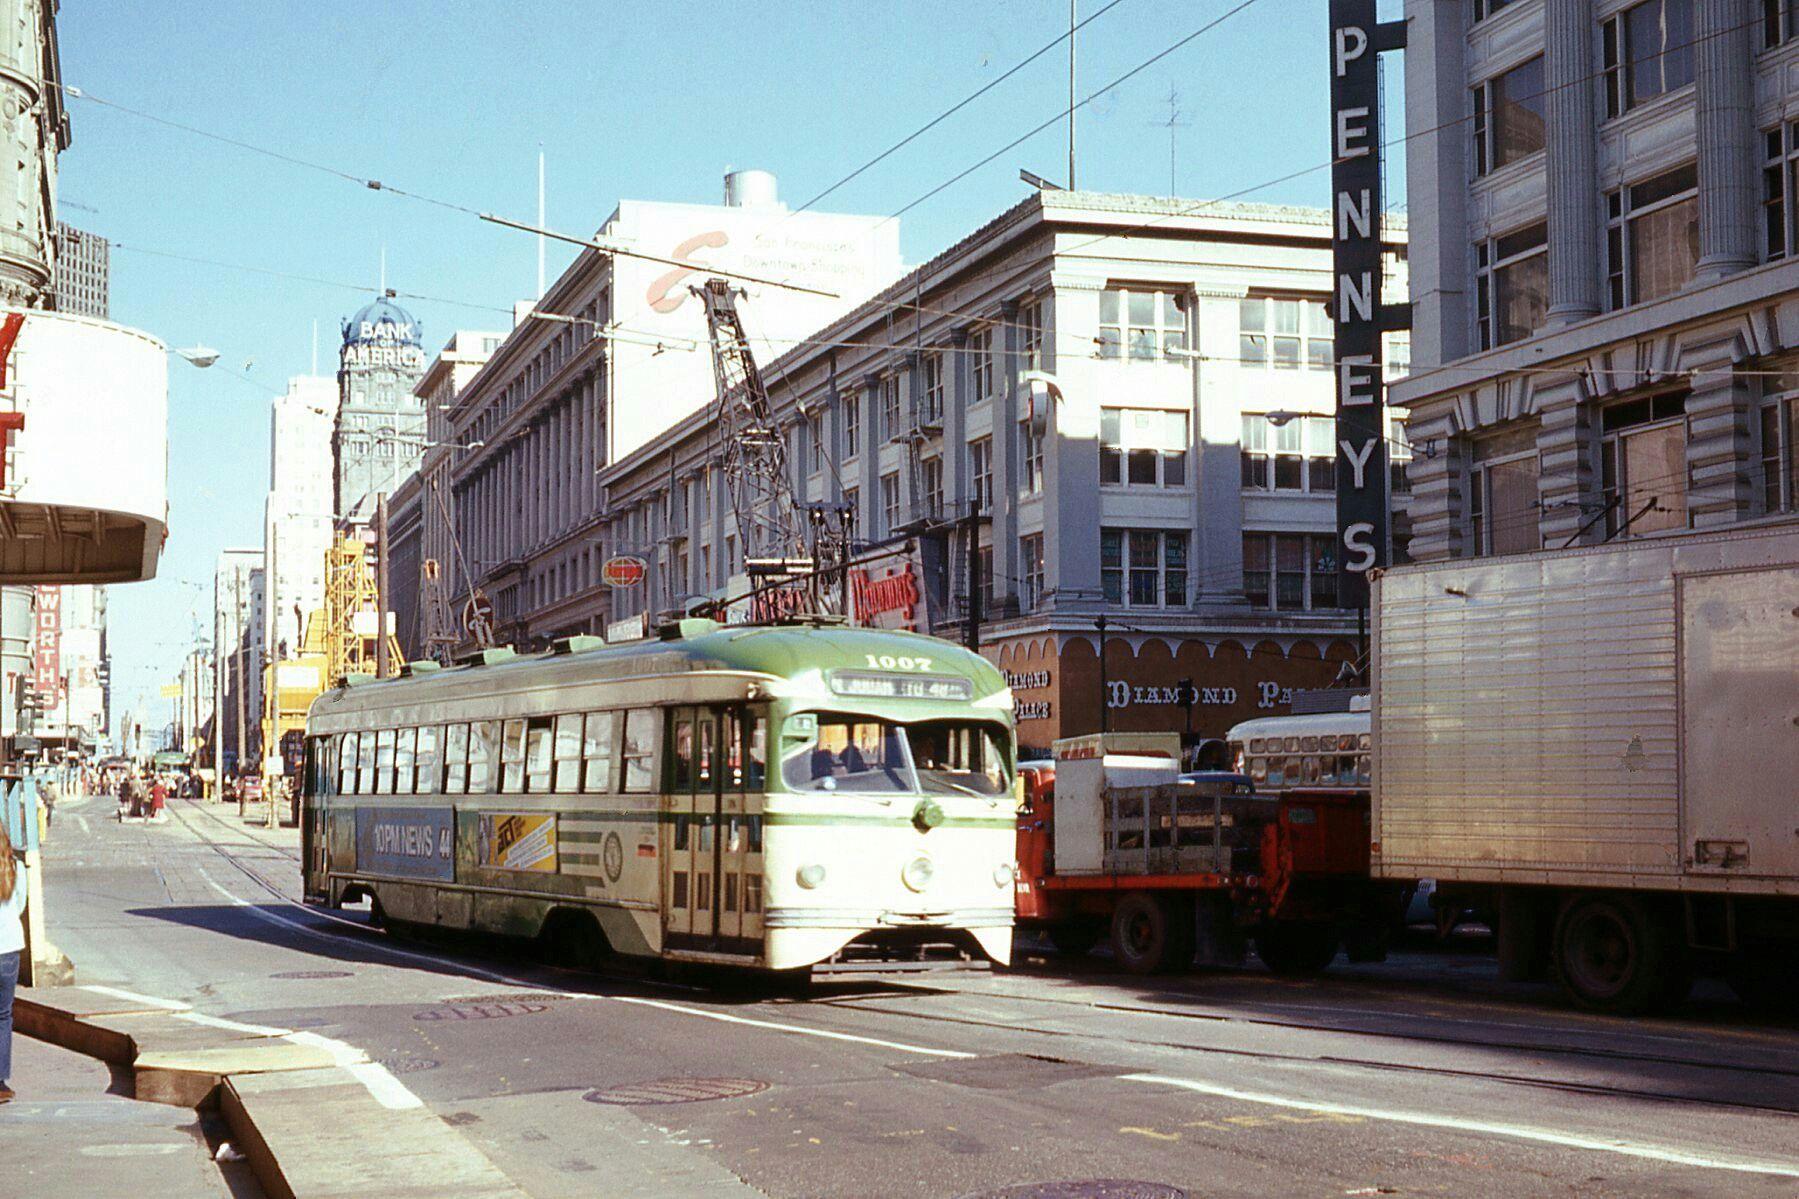 SF MUNI PCC Streetcar Francisco, San, Street view